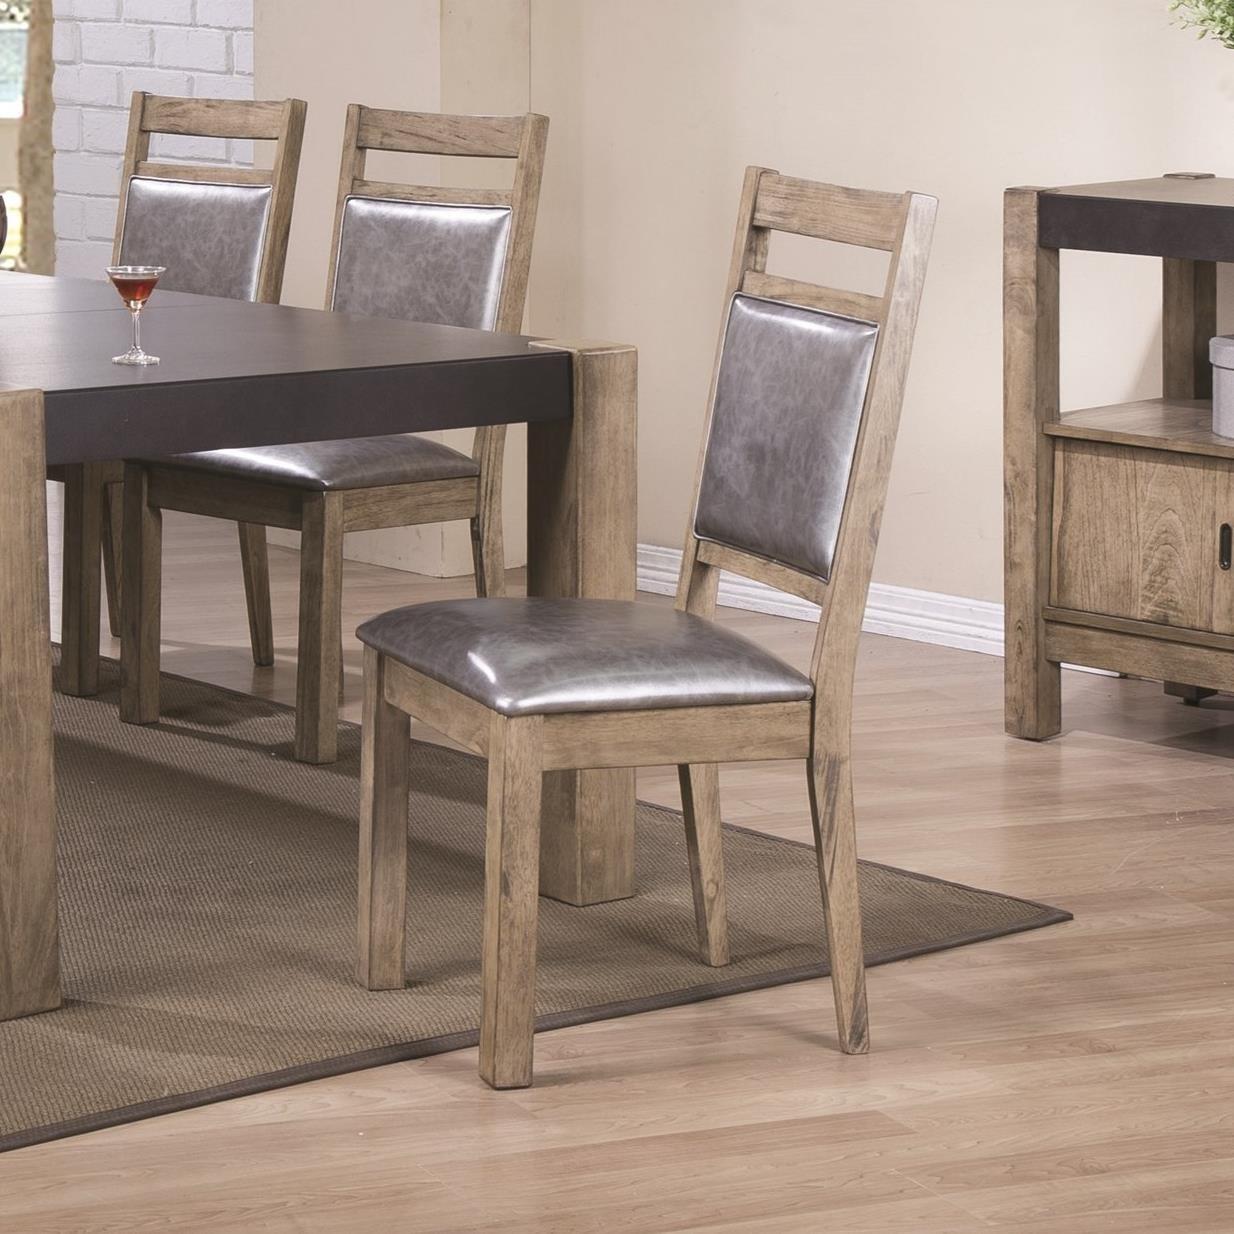 Coaster Ludolf Upholstered Side Chair - Item Number: 107132